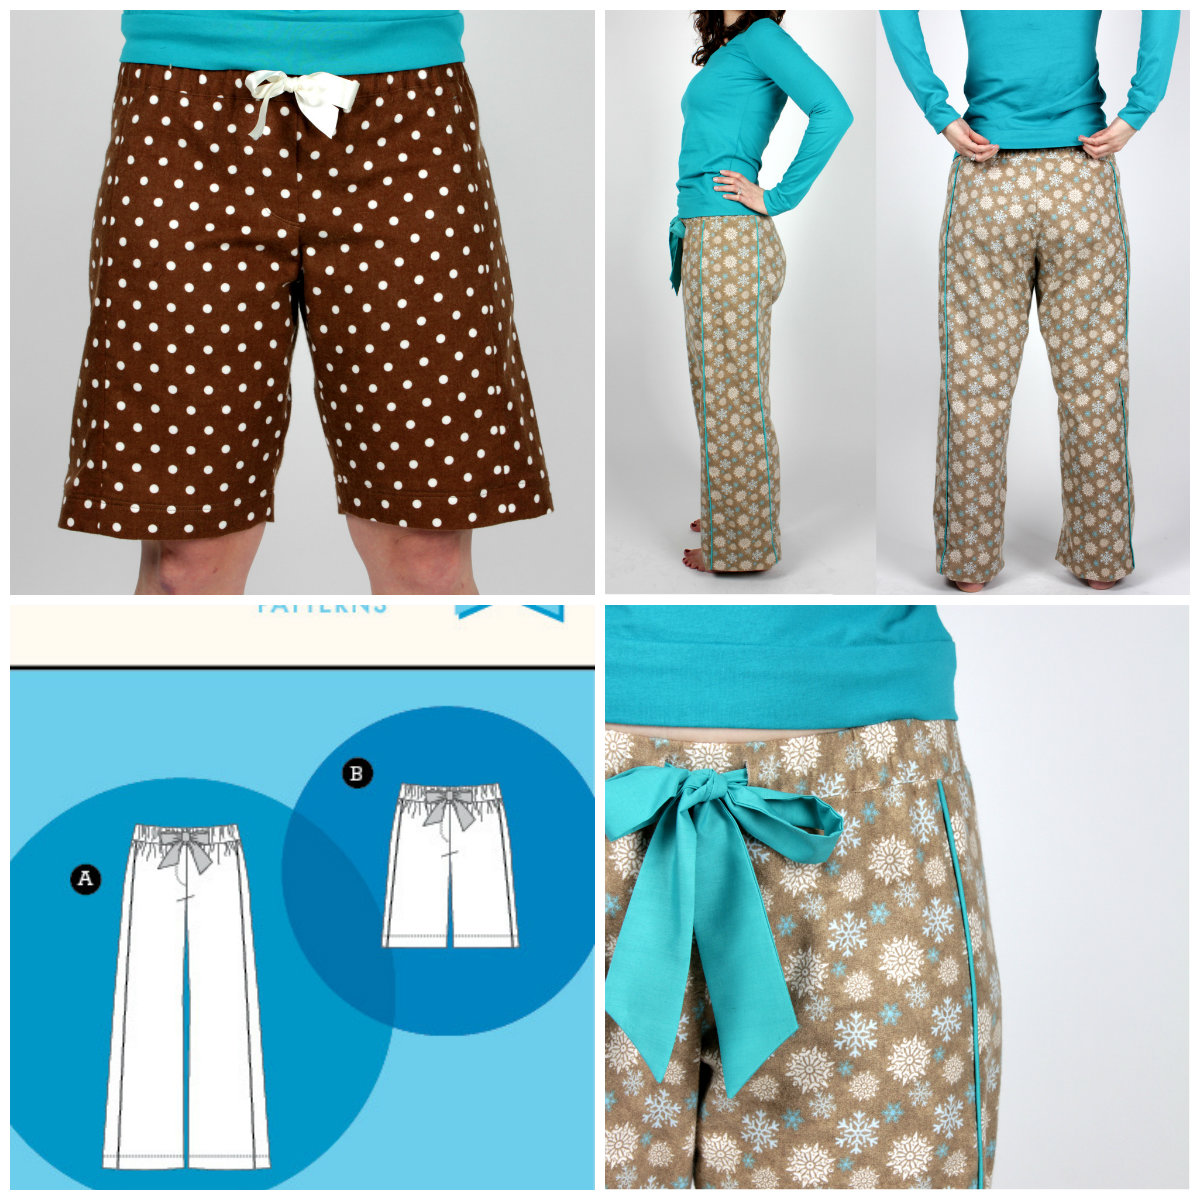 Sewaholic Patterns Tofino pants 1302